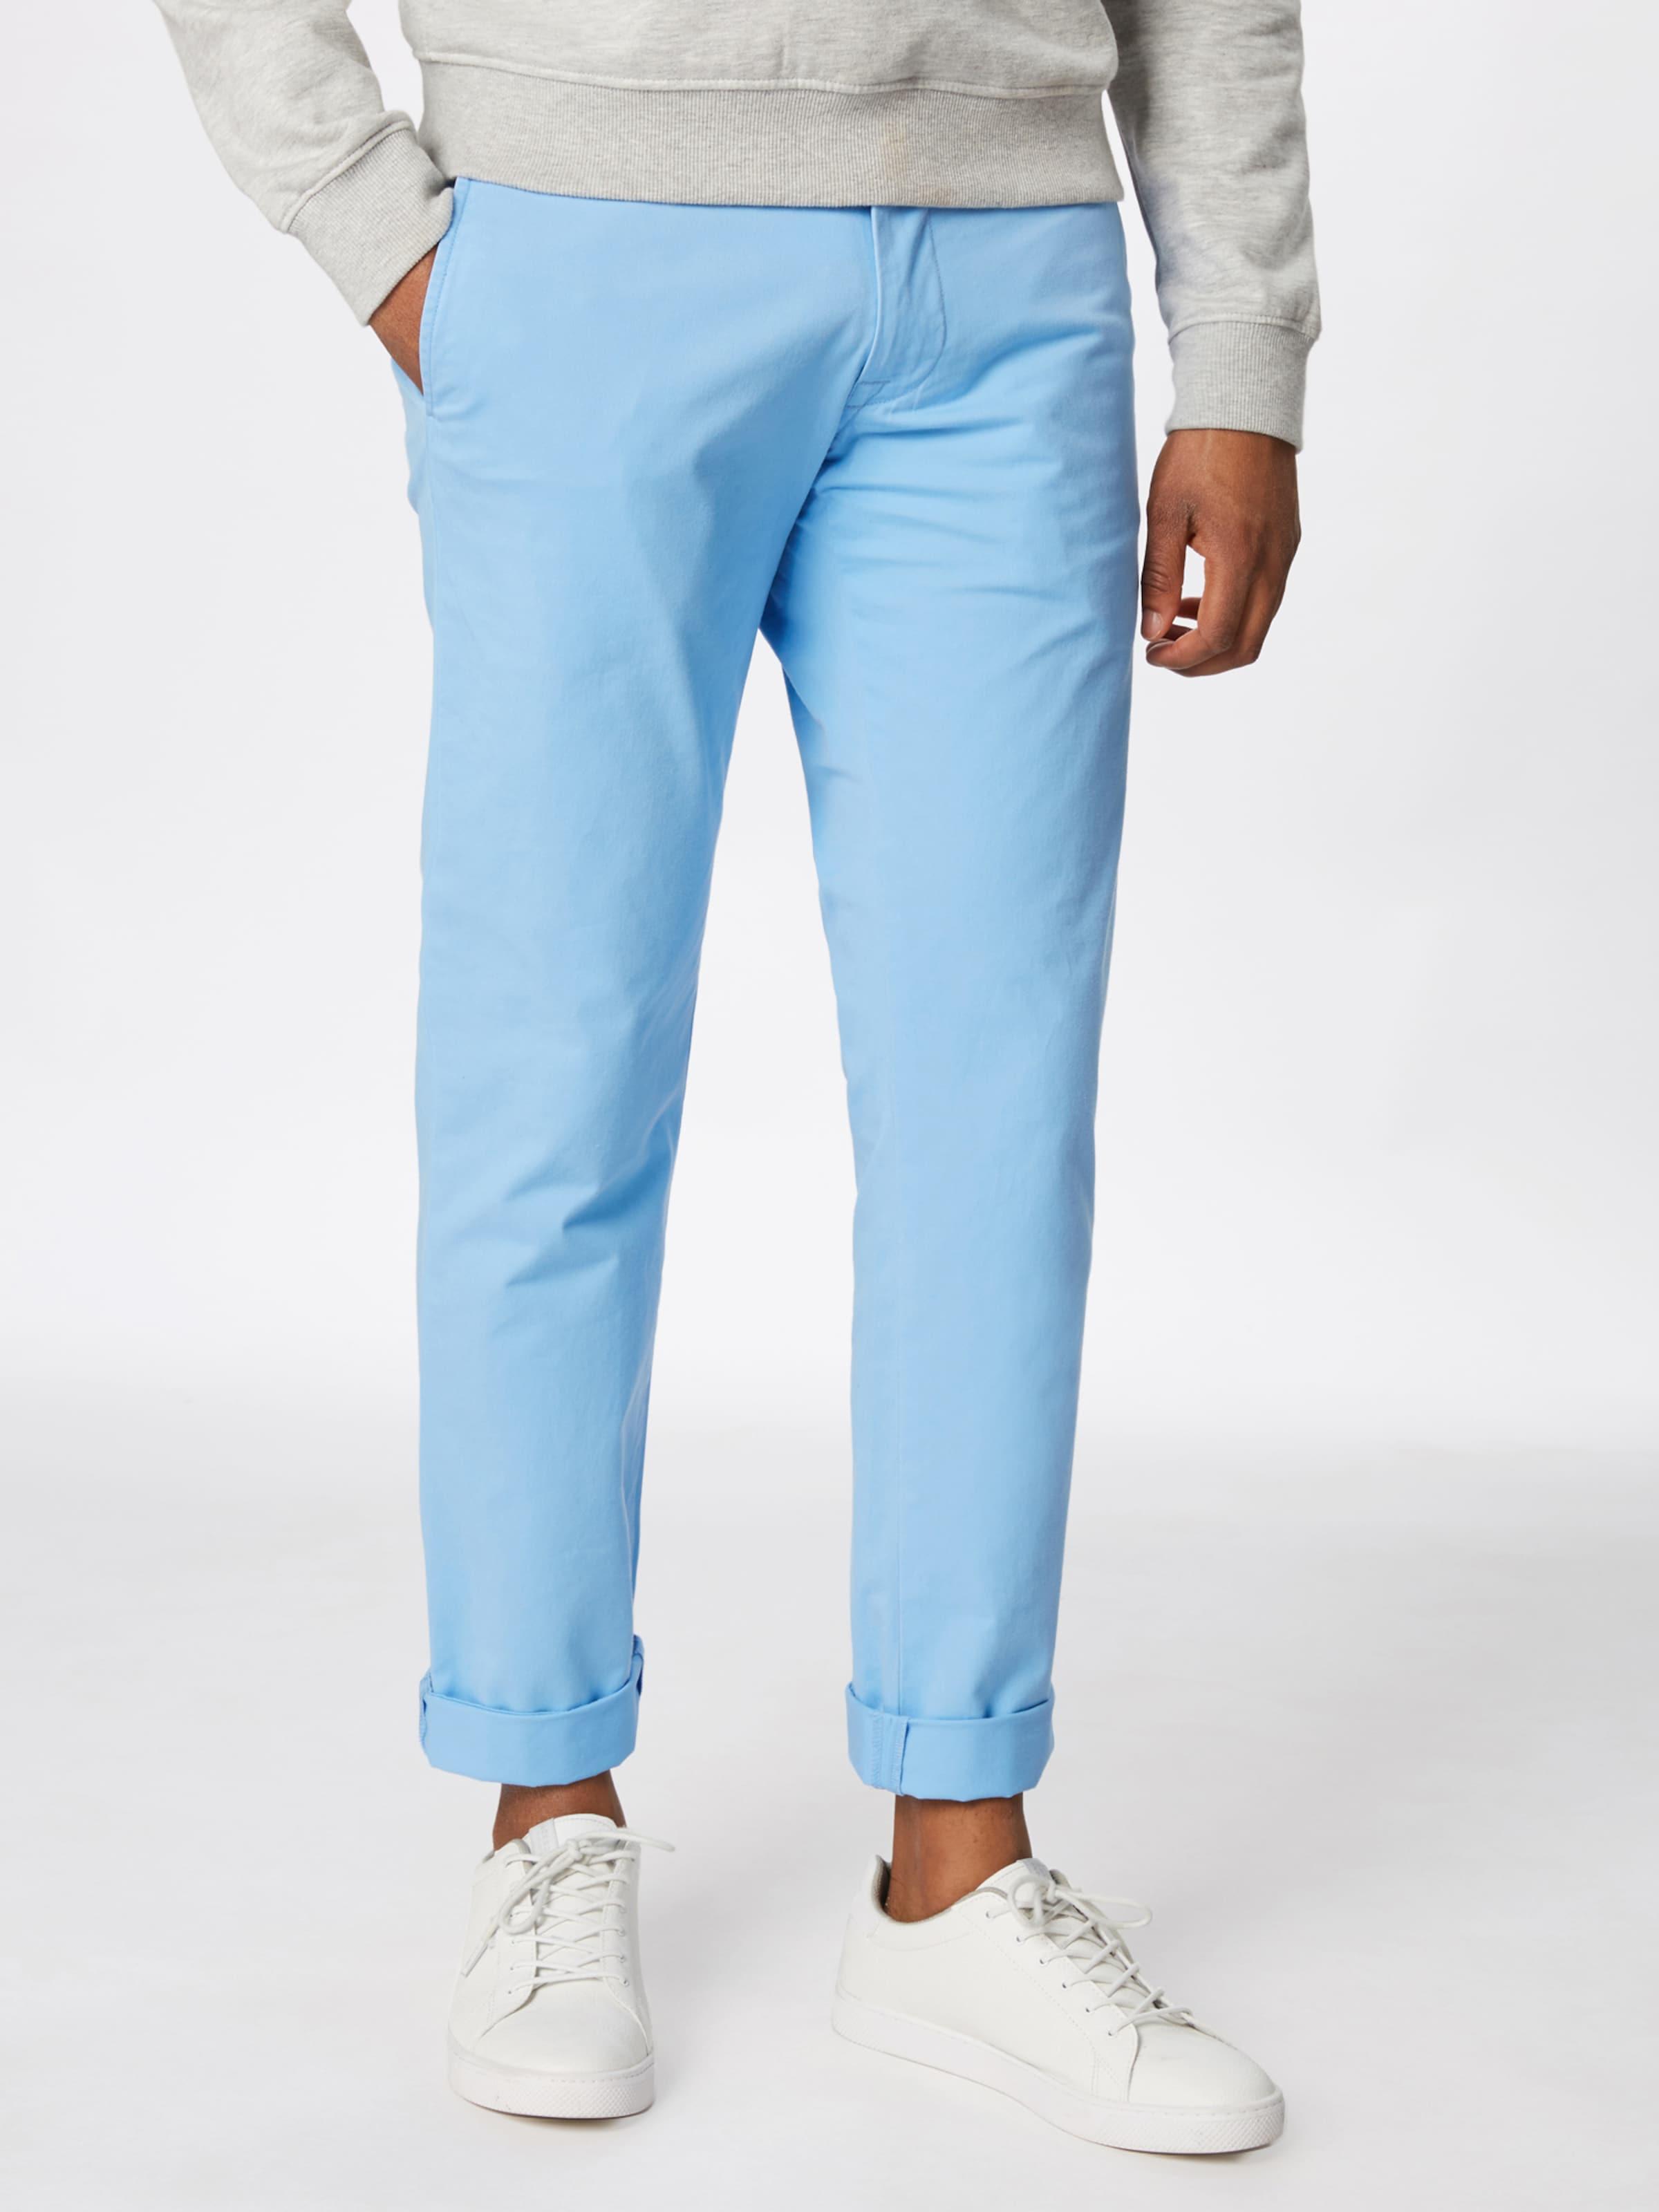 Polo En Ralph Chino Lauren Clair 'bedford' Pantalon Bleu dCWxoBQre